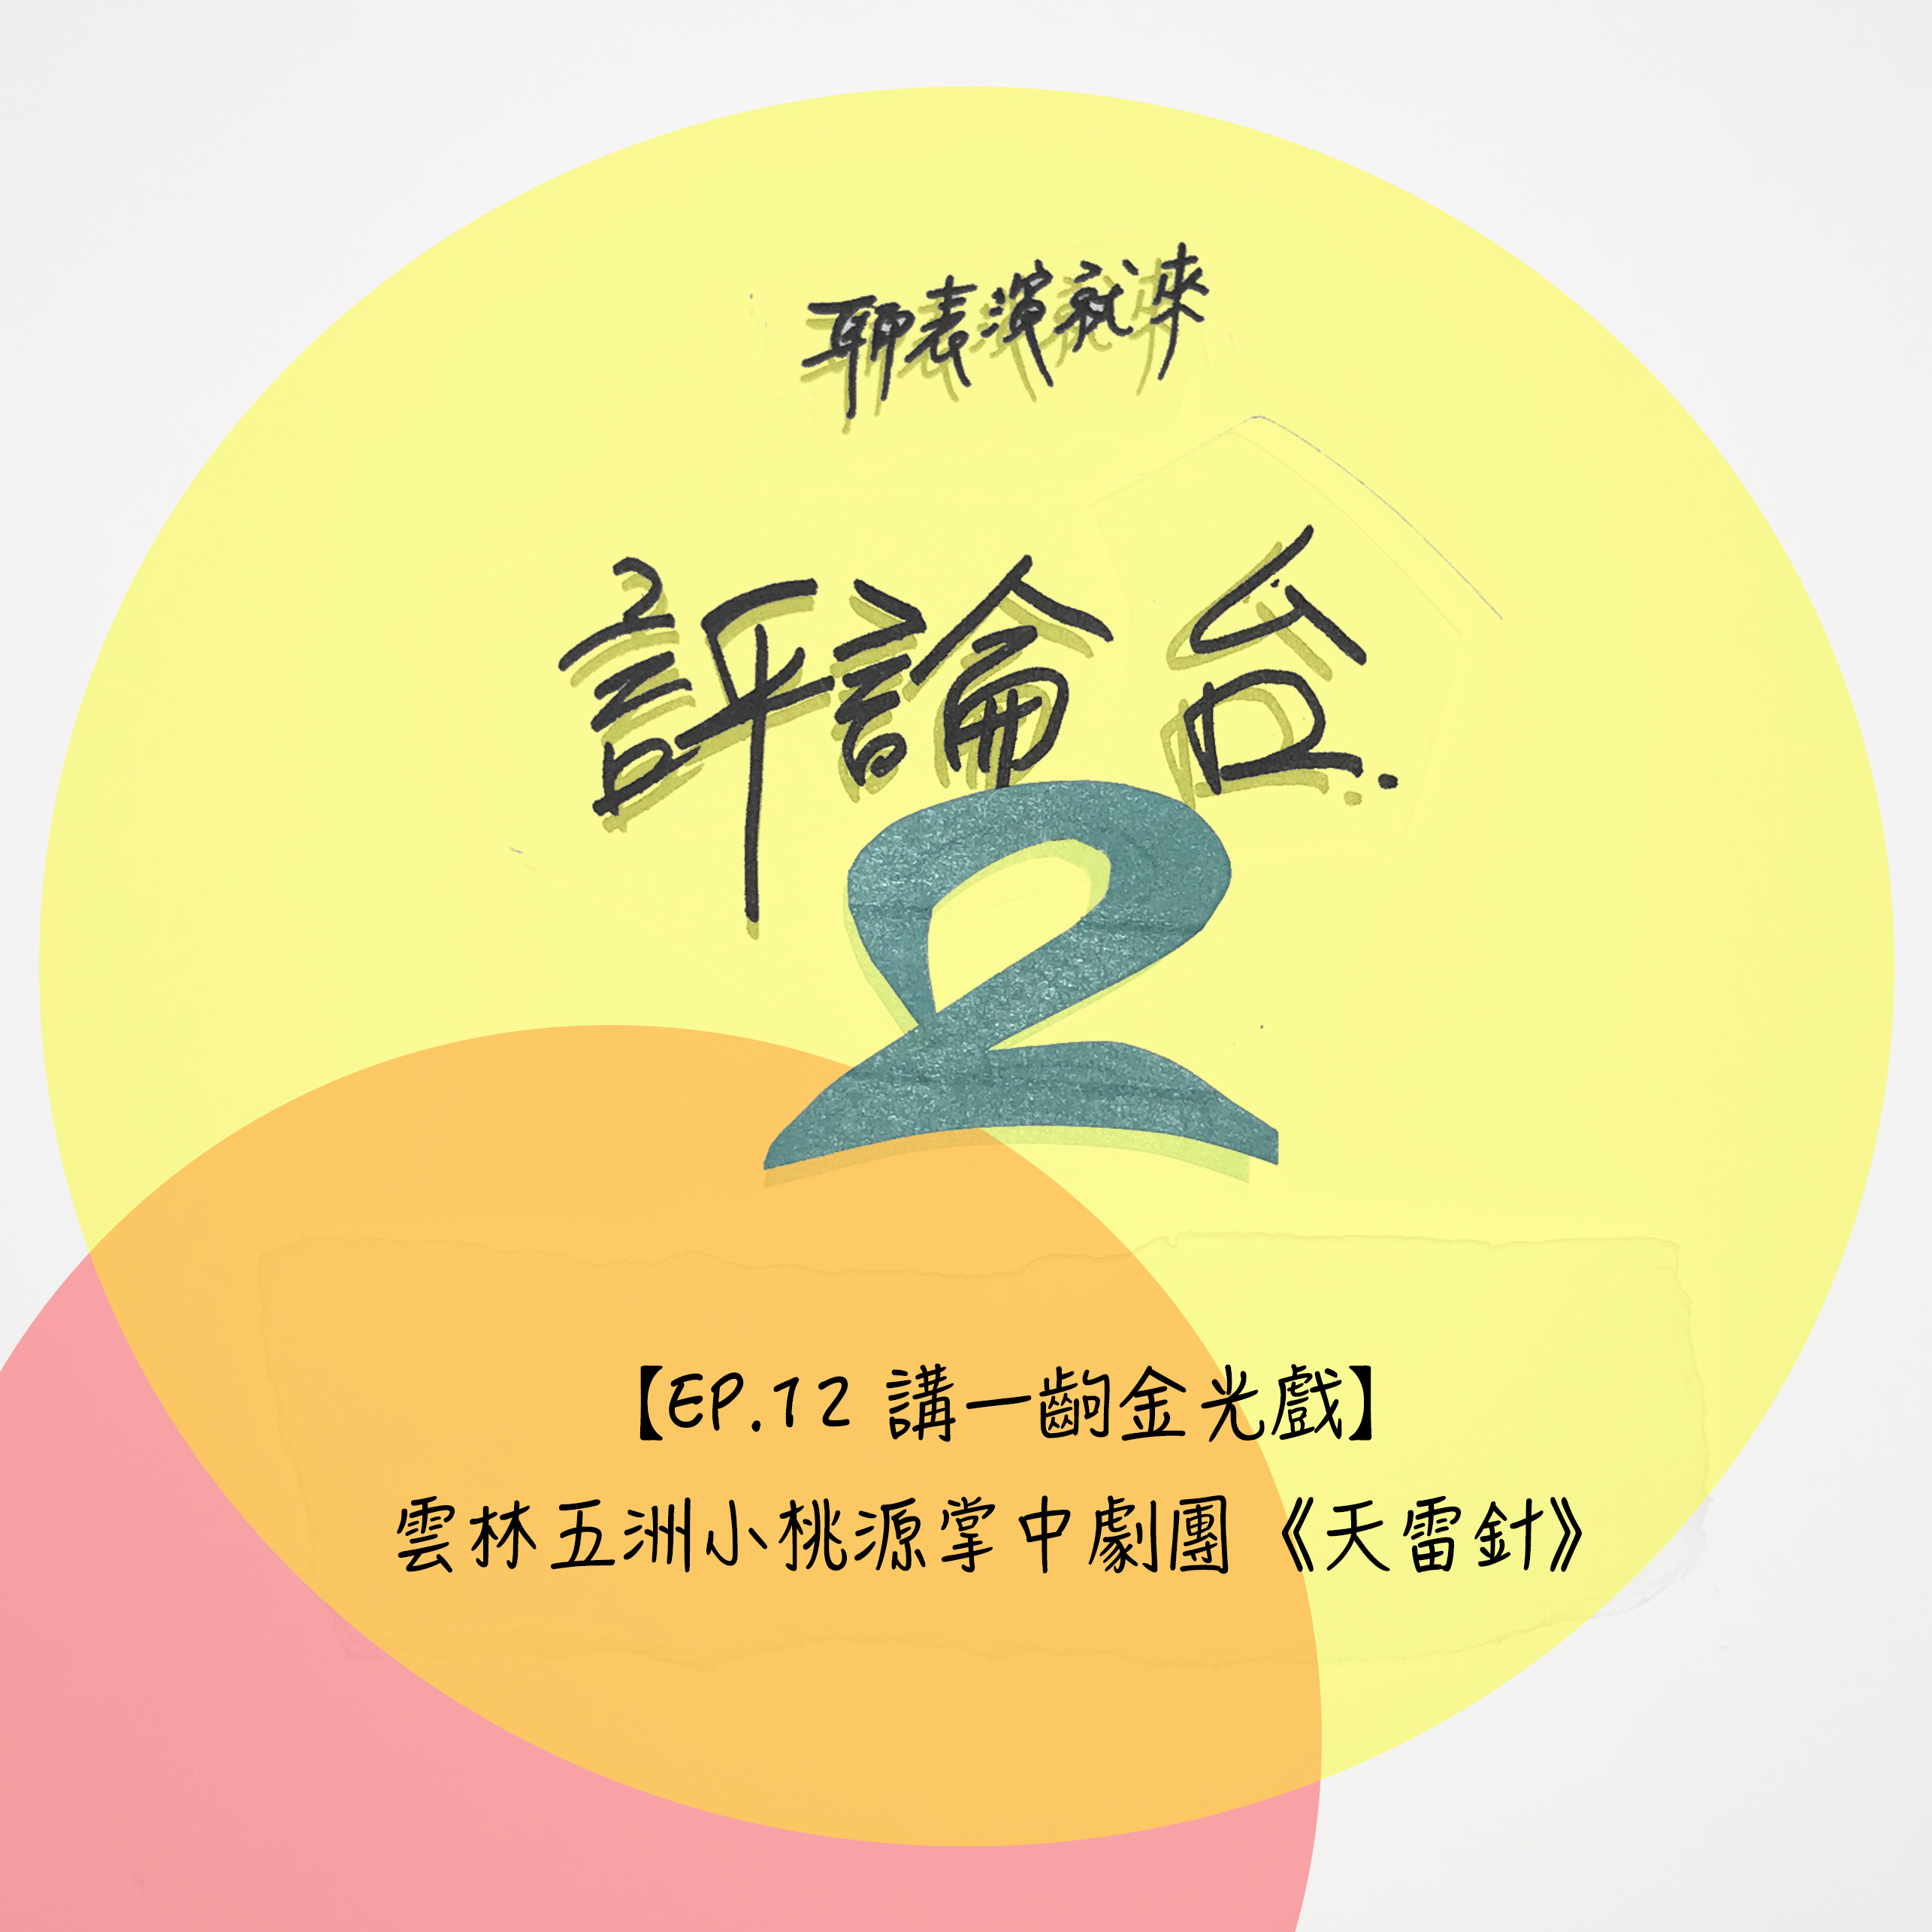 【EP.12 講一齣金光戲】雲林五洲小桃源掌中劇團《天雷針》(白斐嵐+紀慧玲)